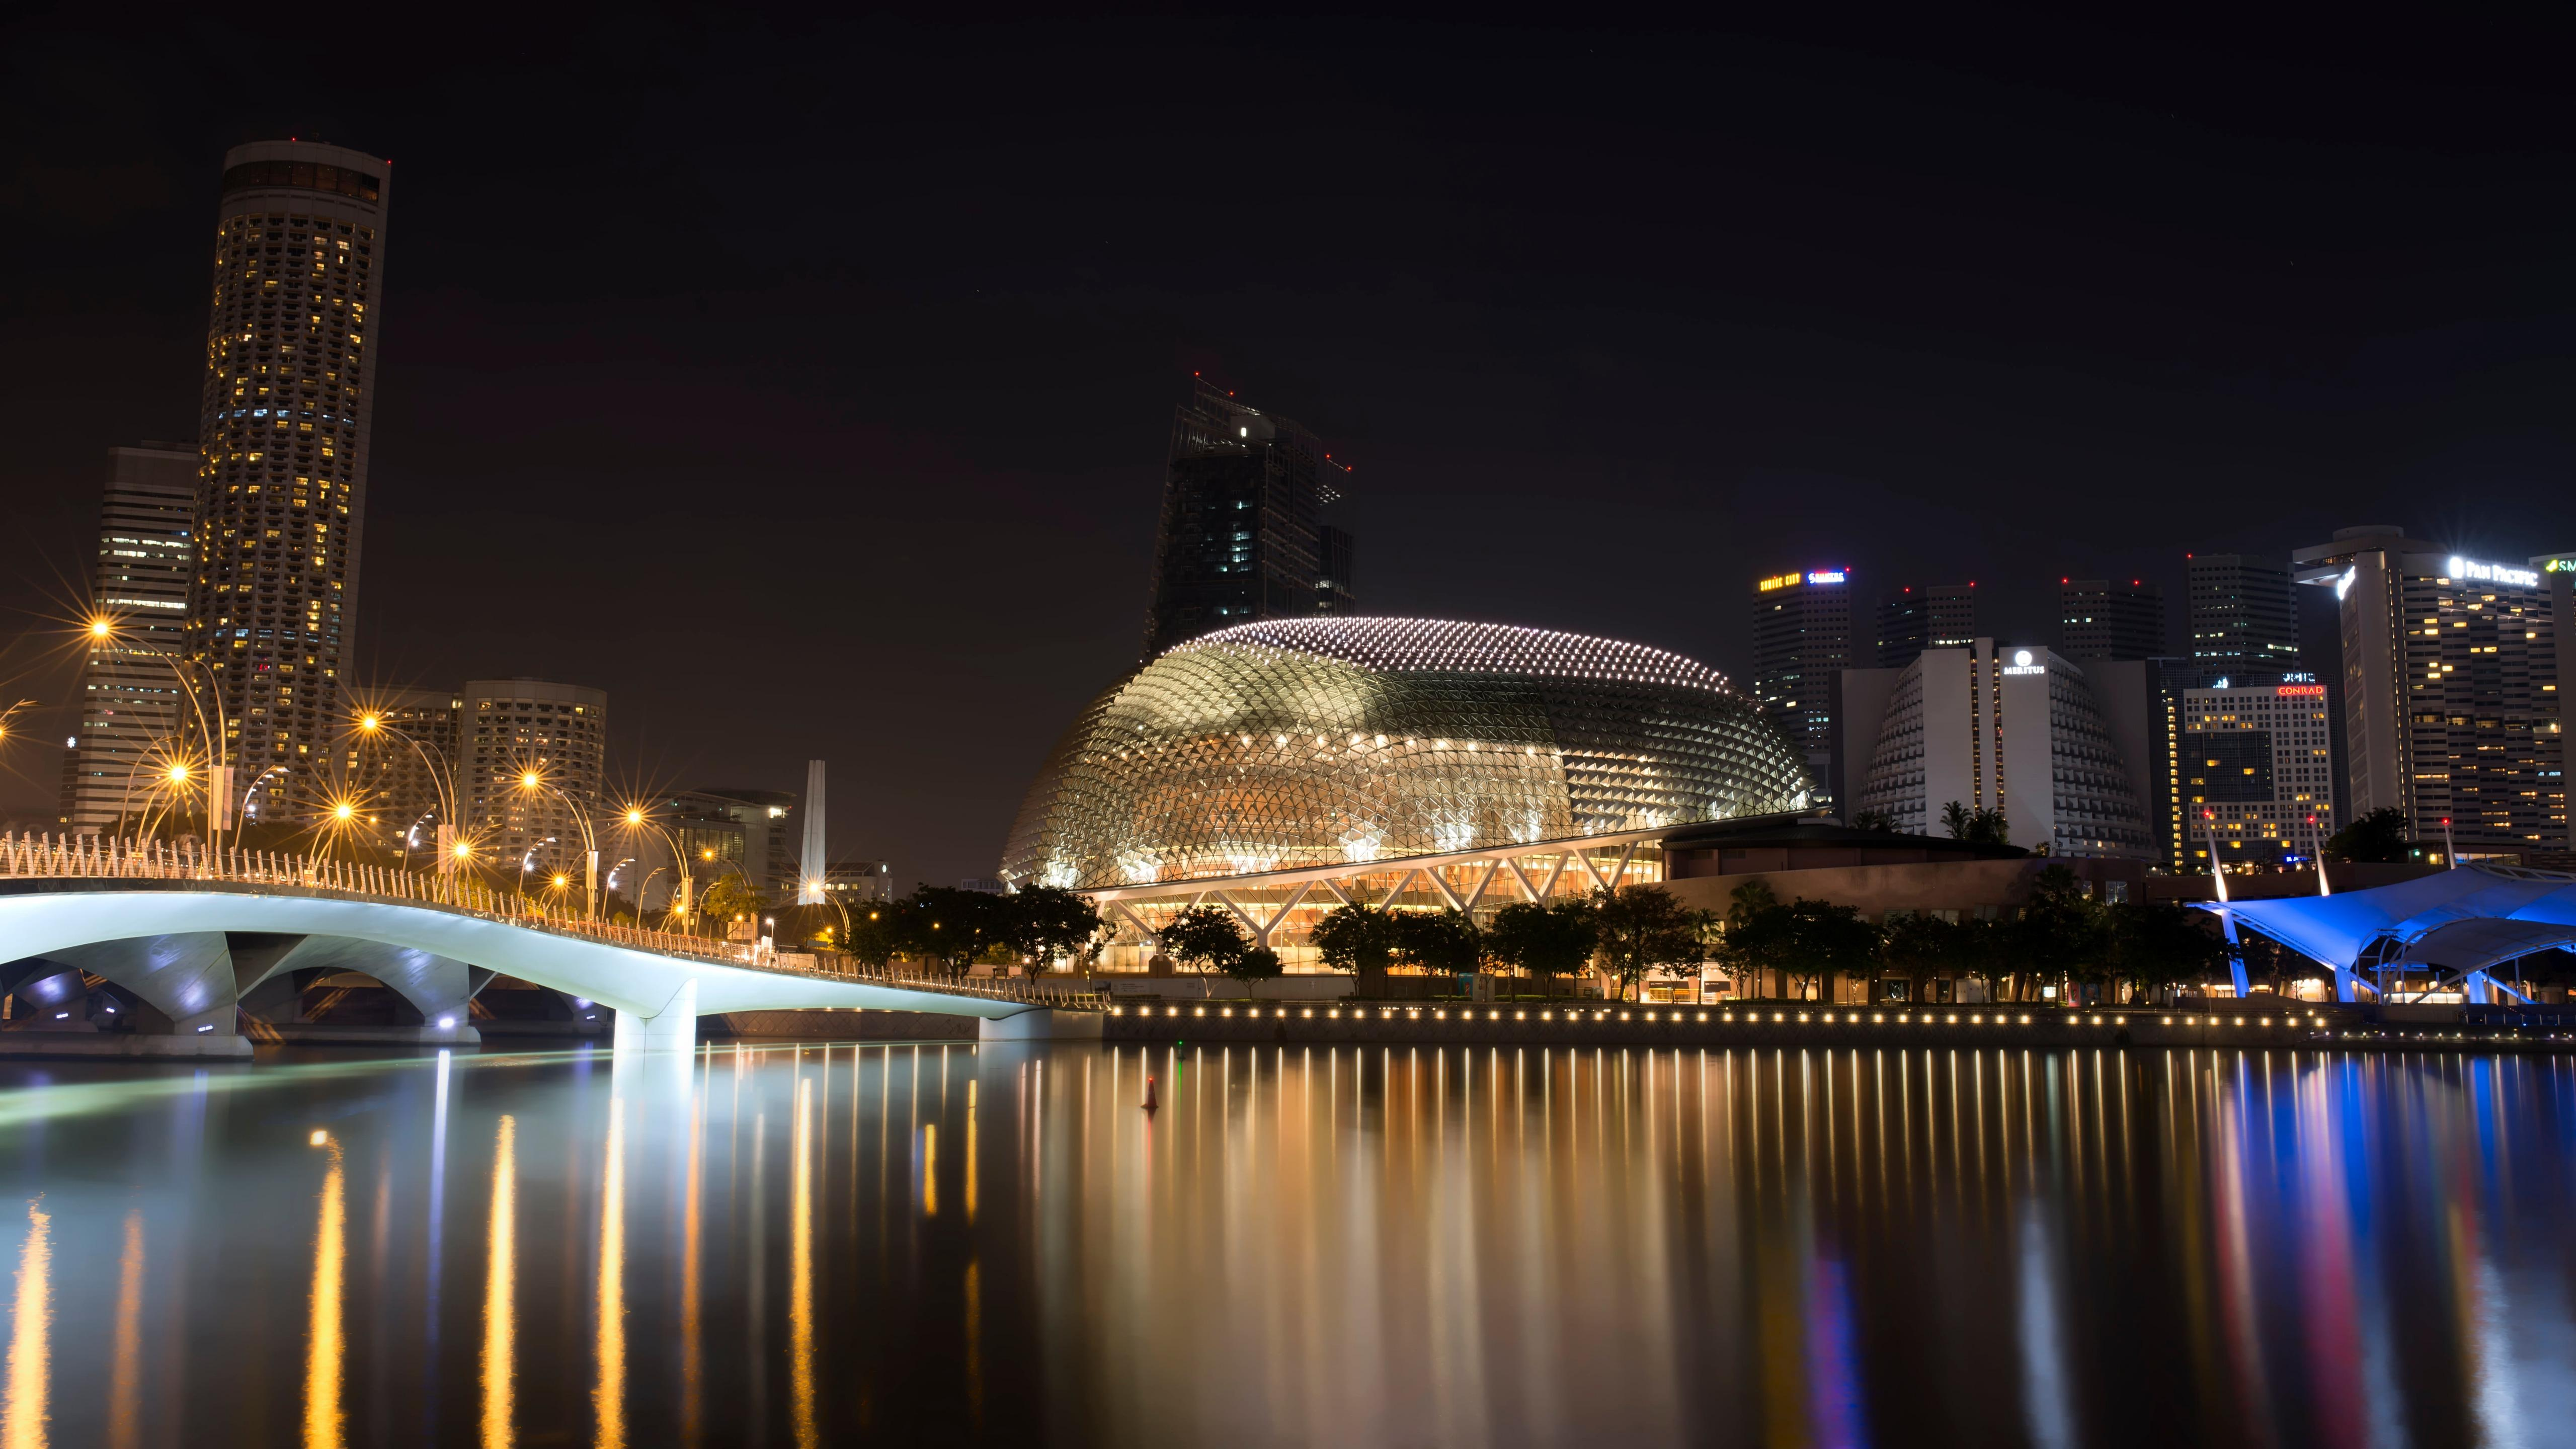 Esplanade - Theatres on the Bay, Singapore wallpaper